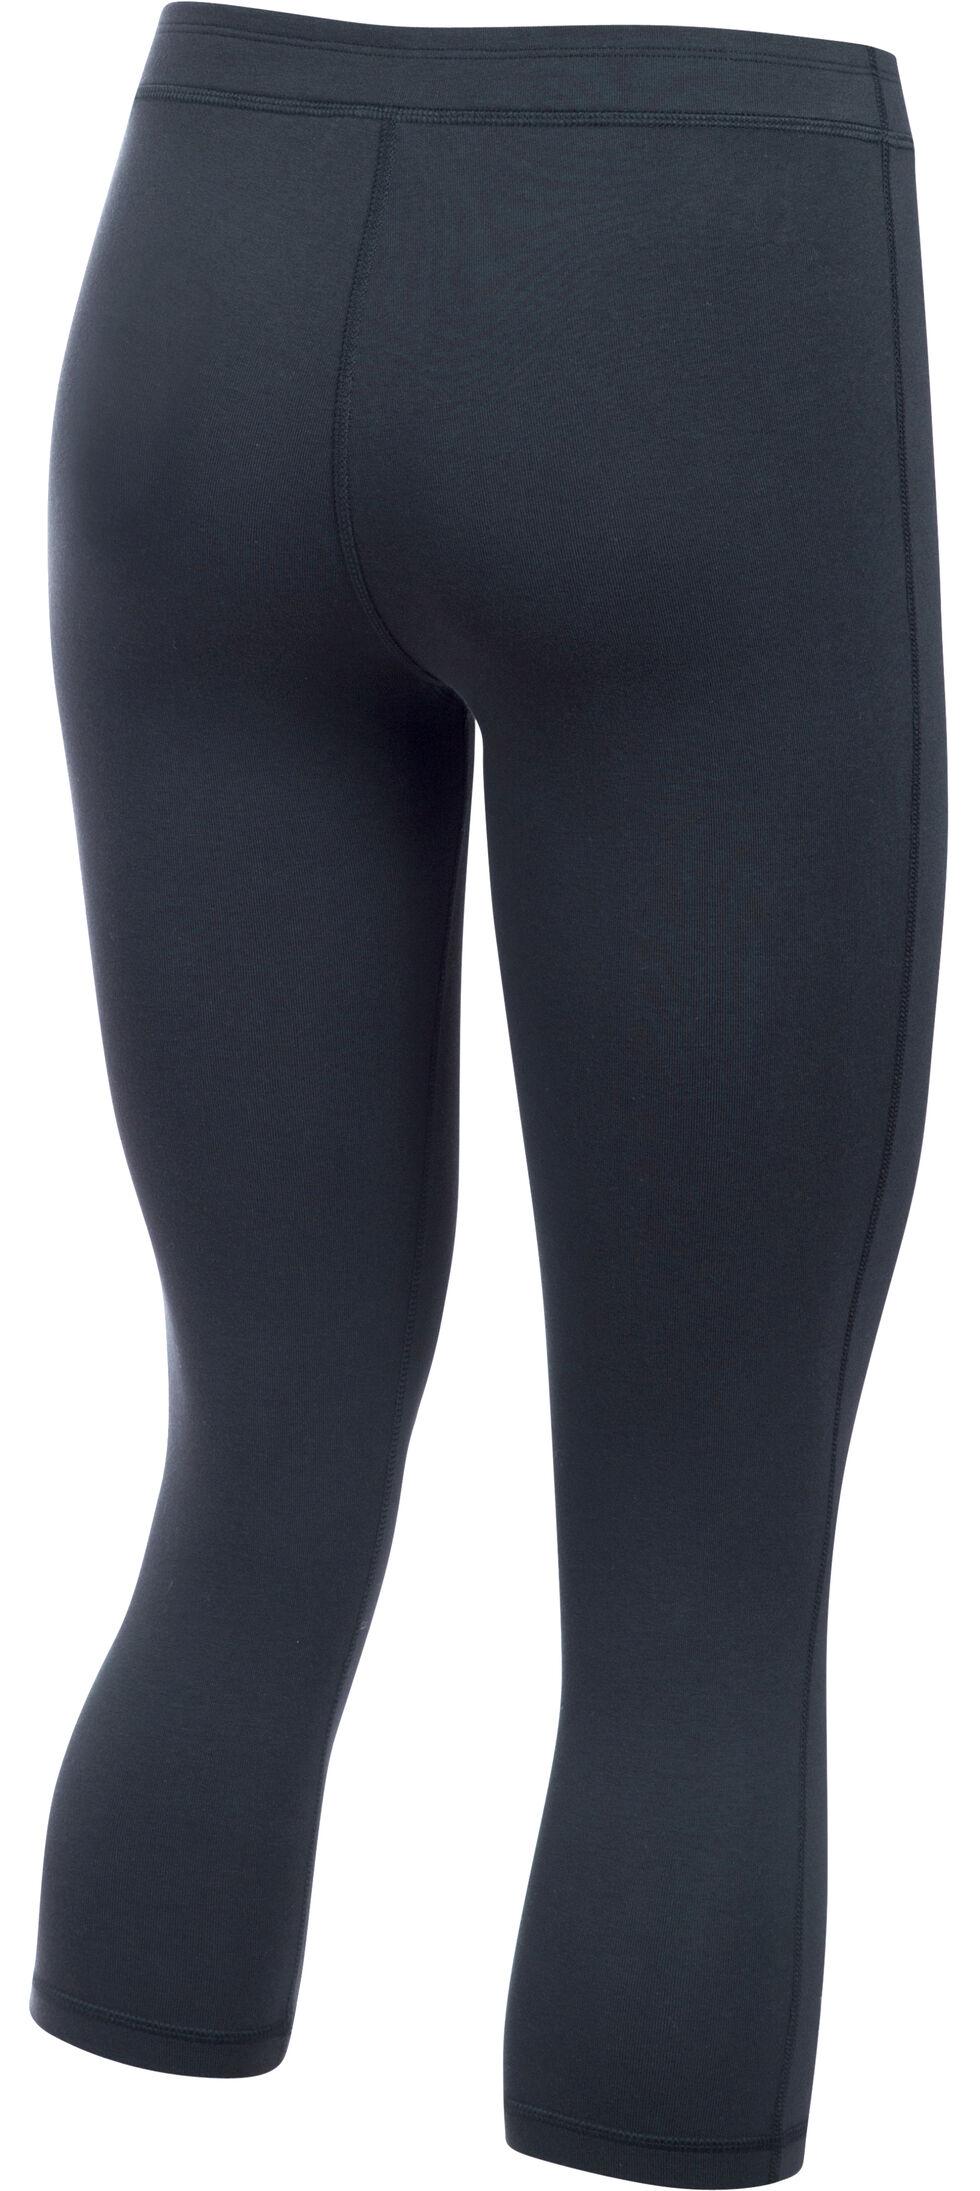 Under Armour Women's Black HeatGear® Training Capris, Black, hi-res